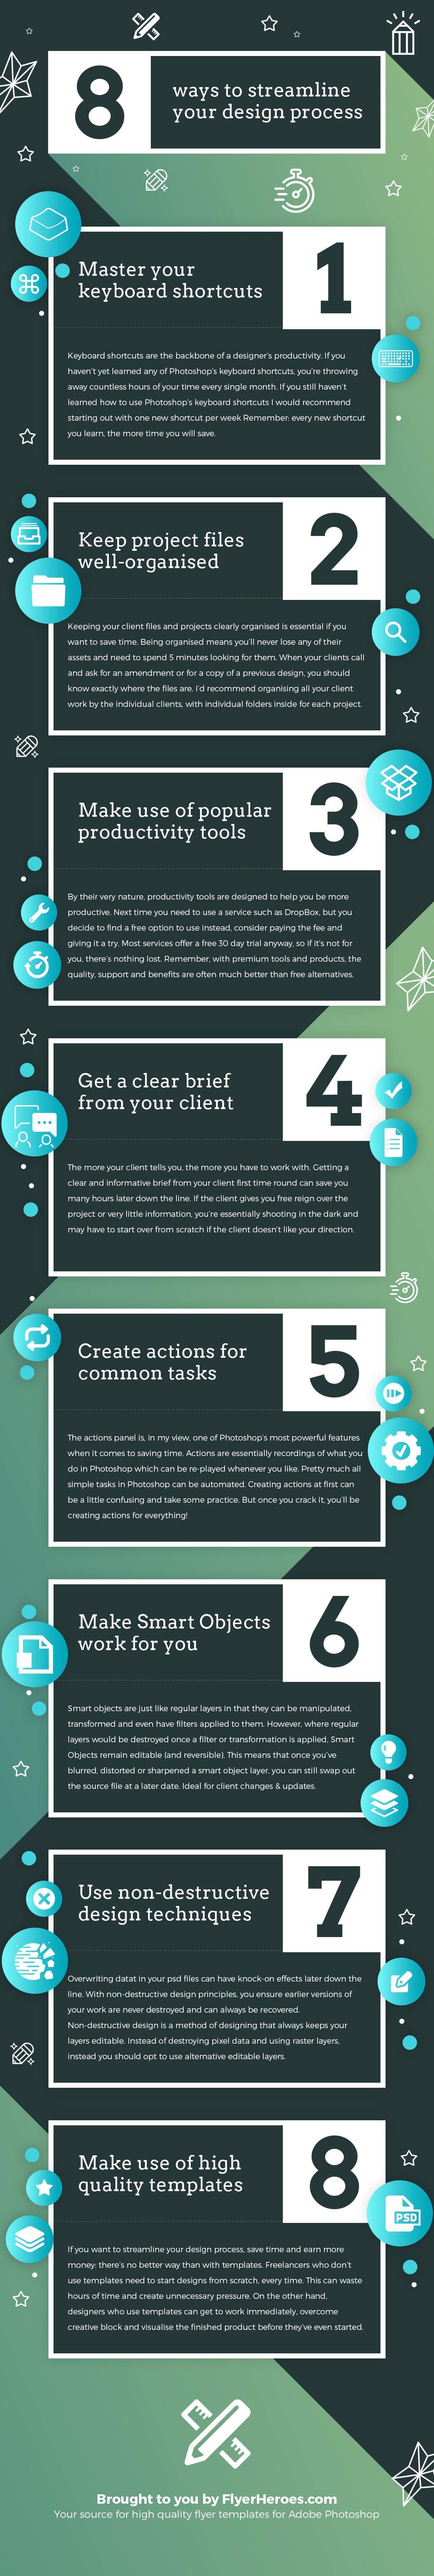 Streamline Design Process Infographic